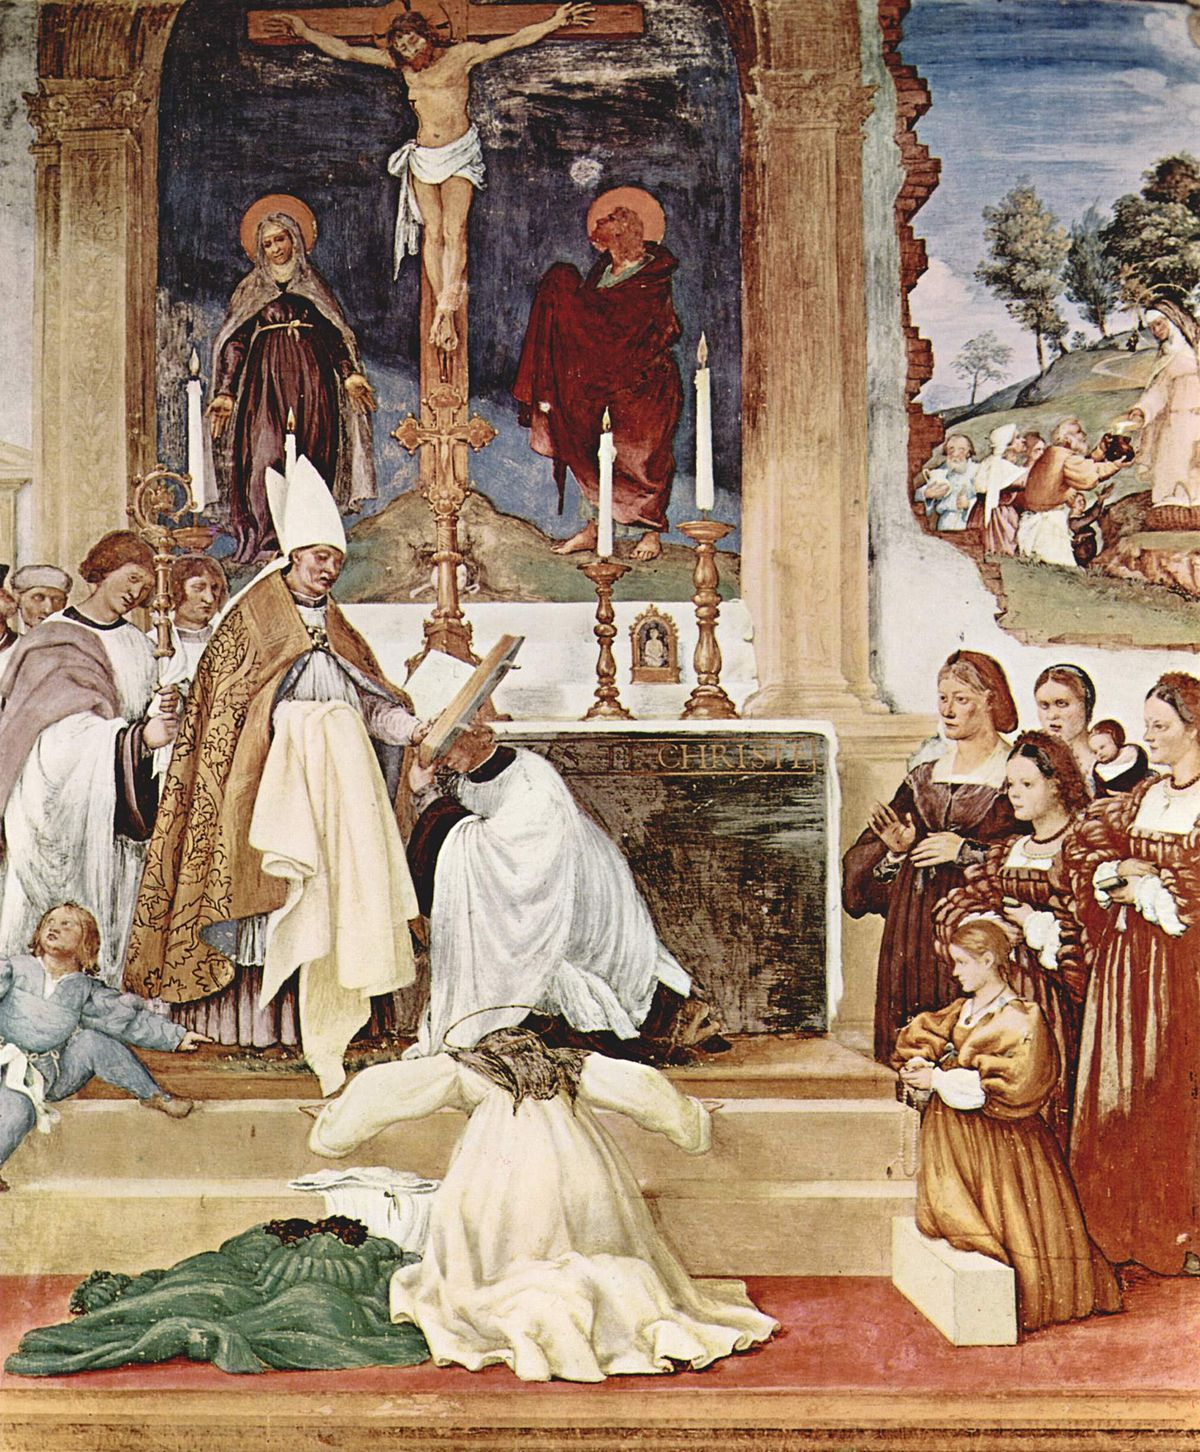 Billedresultat for Medieval religious thesis